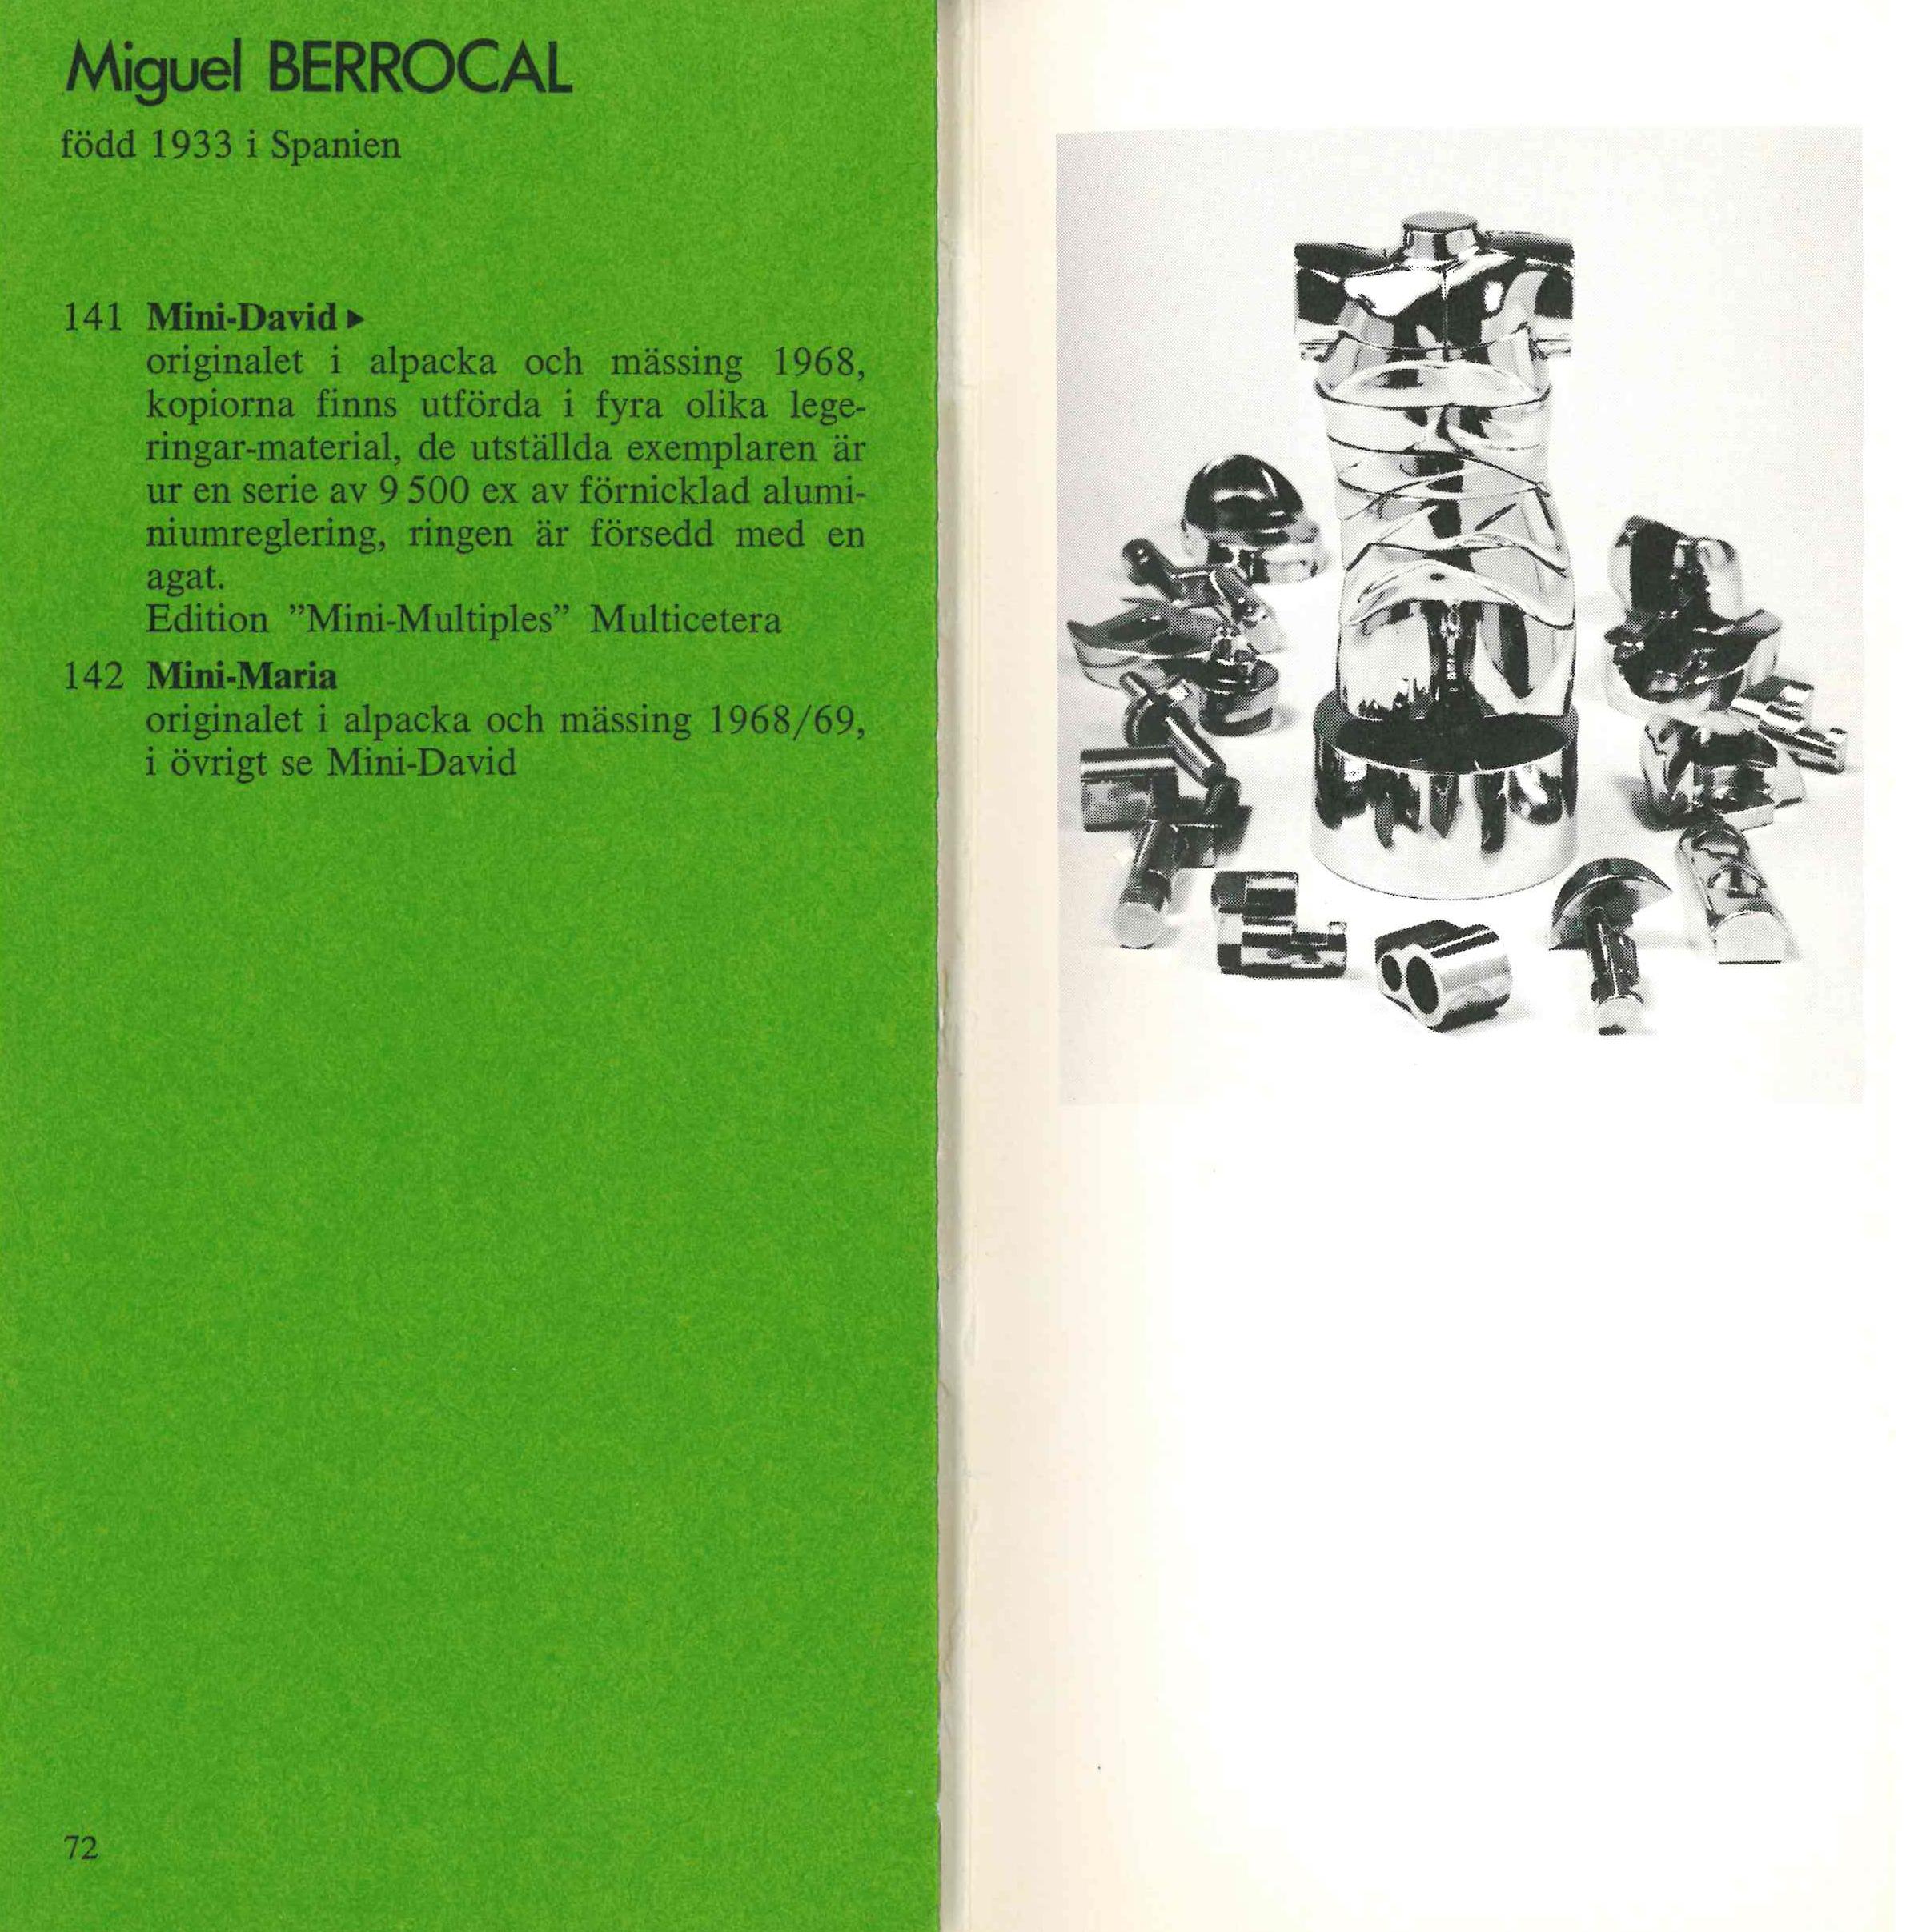 Kataloguppslag